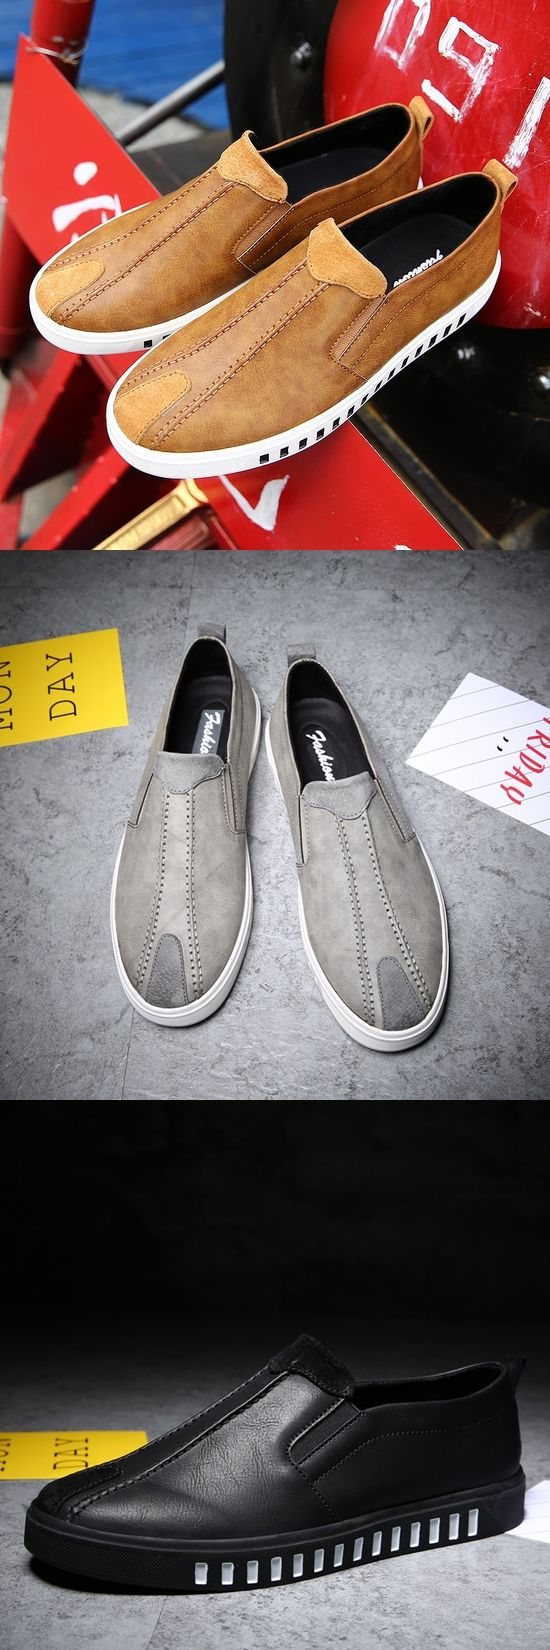 Handmade Men Genuine Leather Shoes